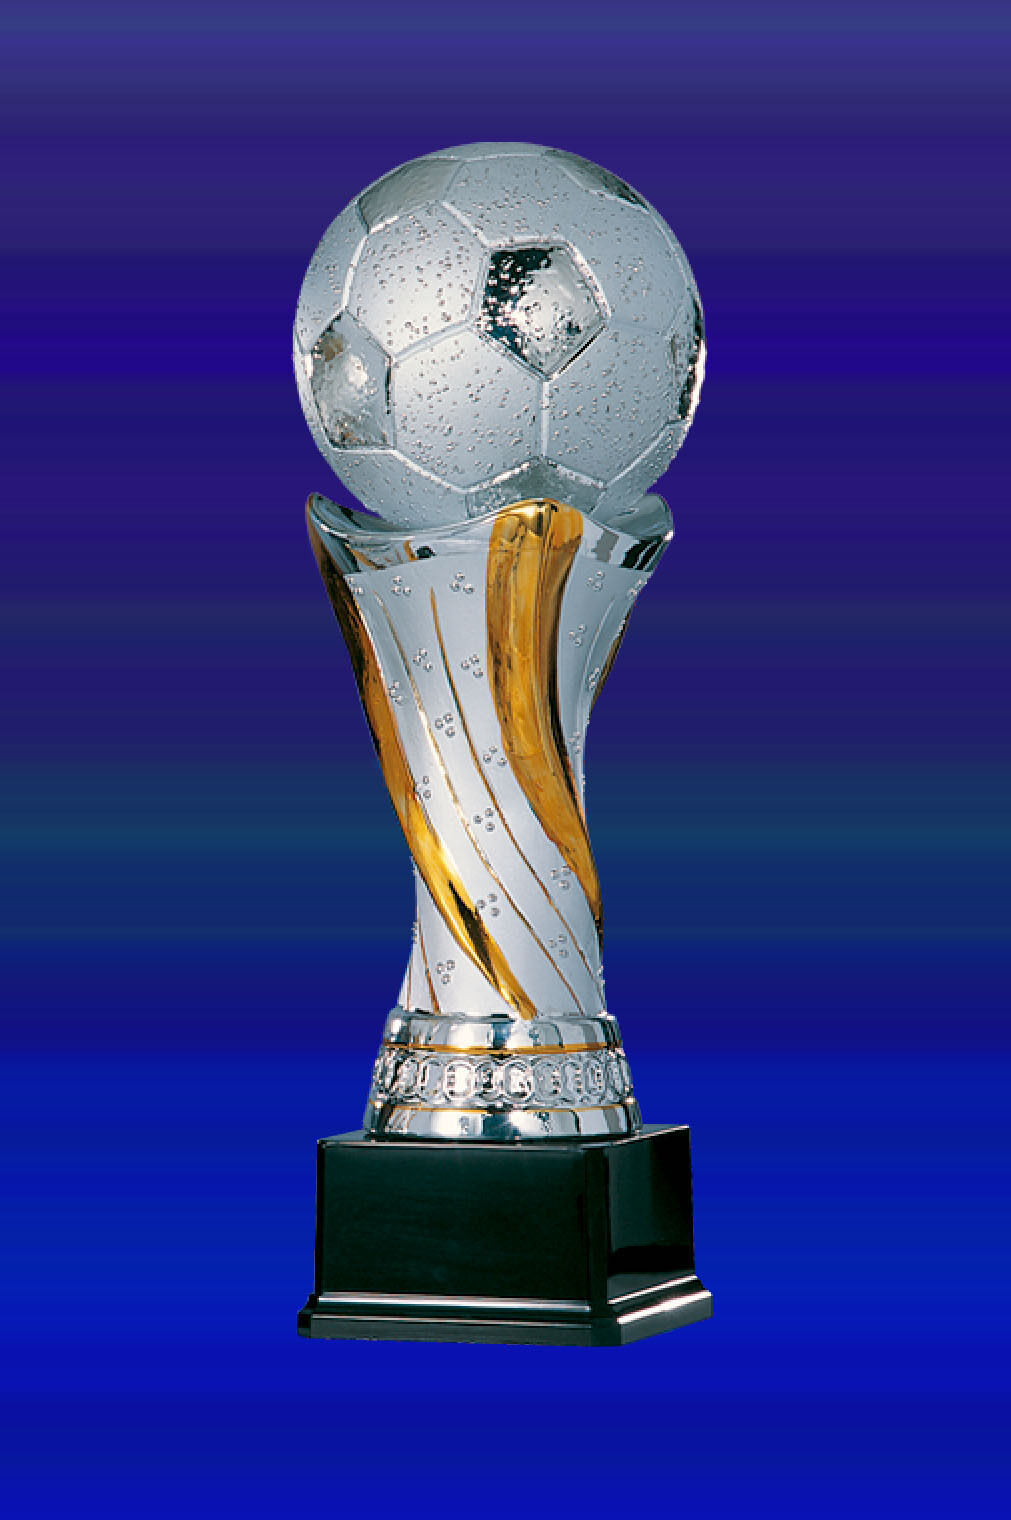 Edle Fußballtrophäe aus Keramik incl.Gravur (43cm hoch) hoch) hoch) 256e70